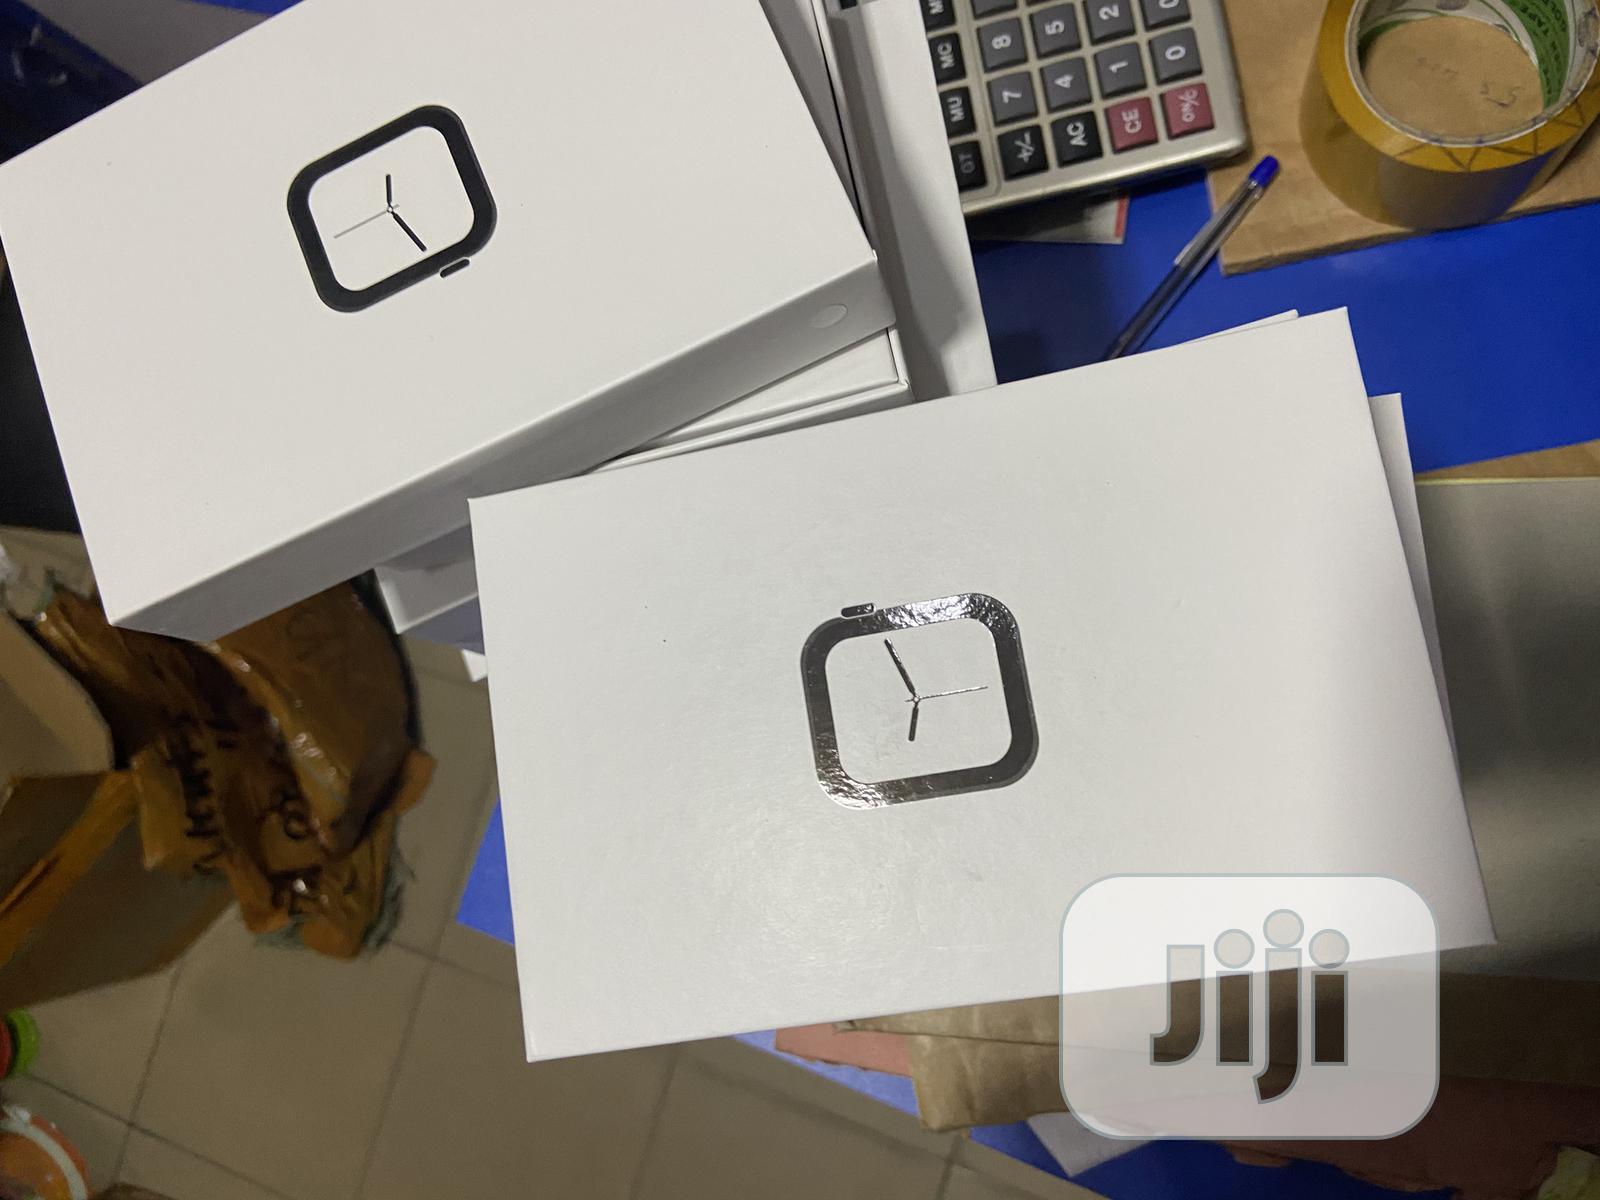 F10 Smart Wrist Watch